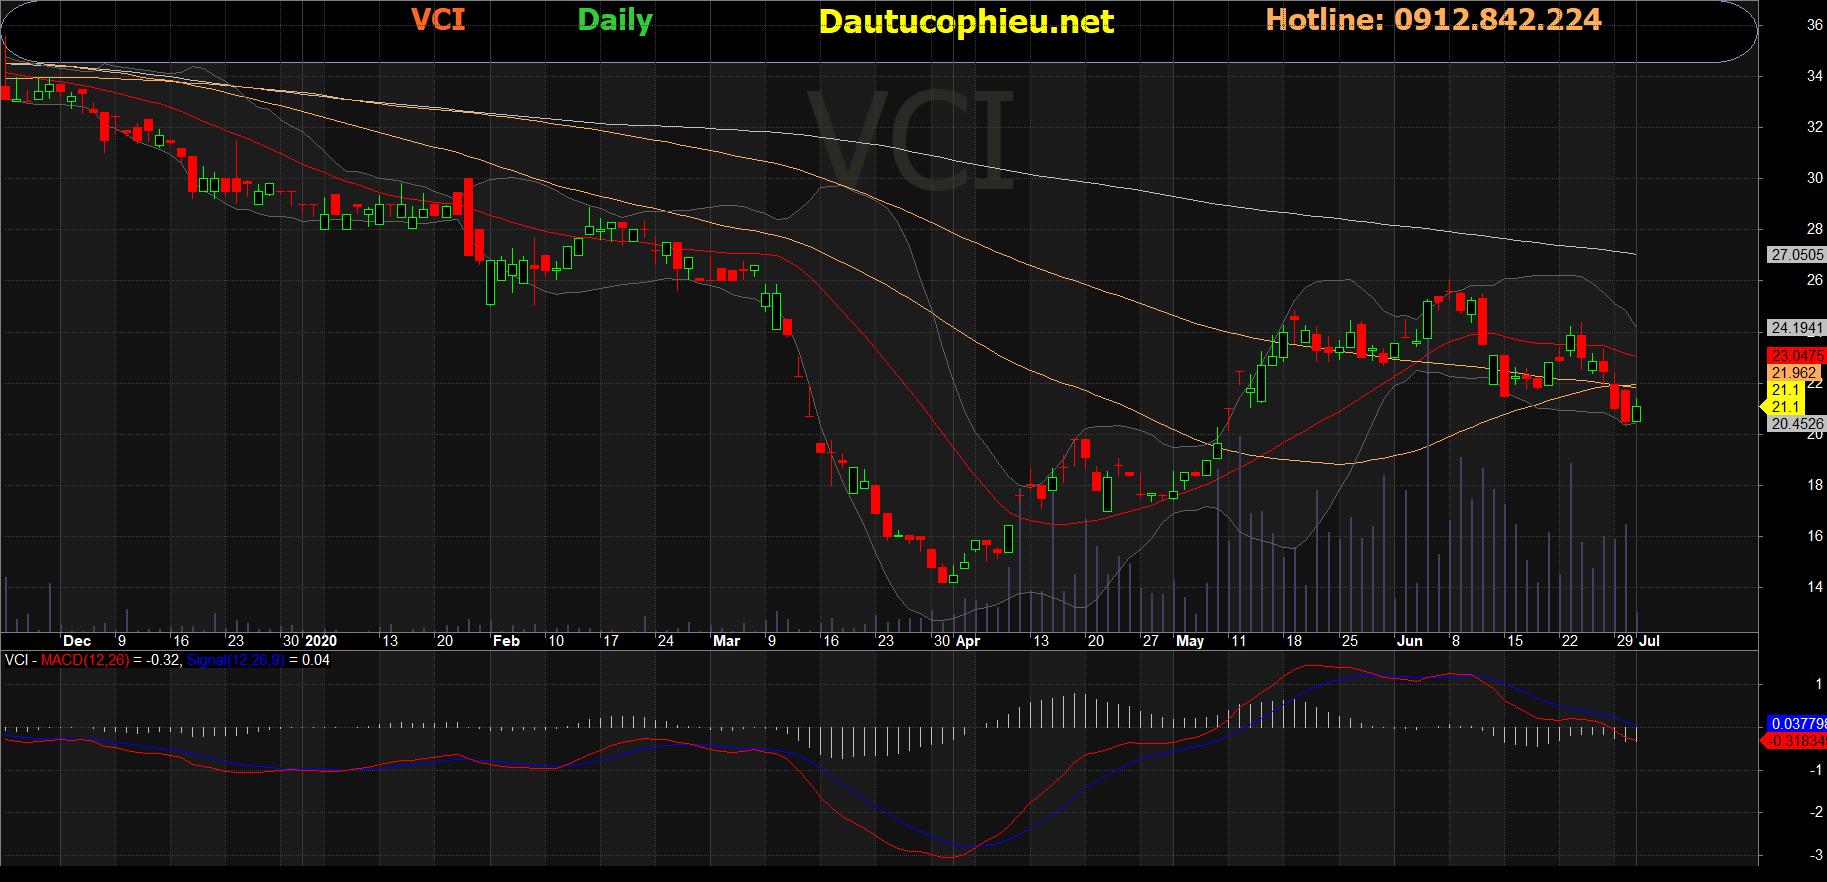 Cổ phiếu VCI